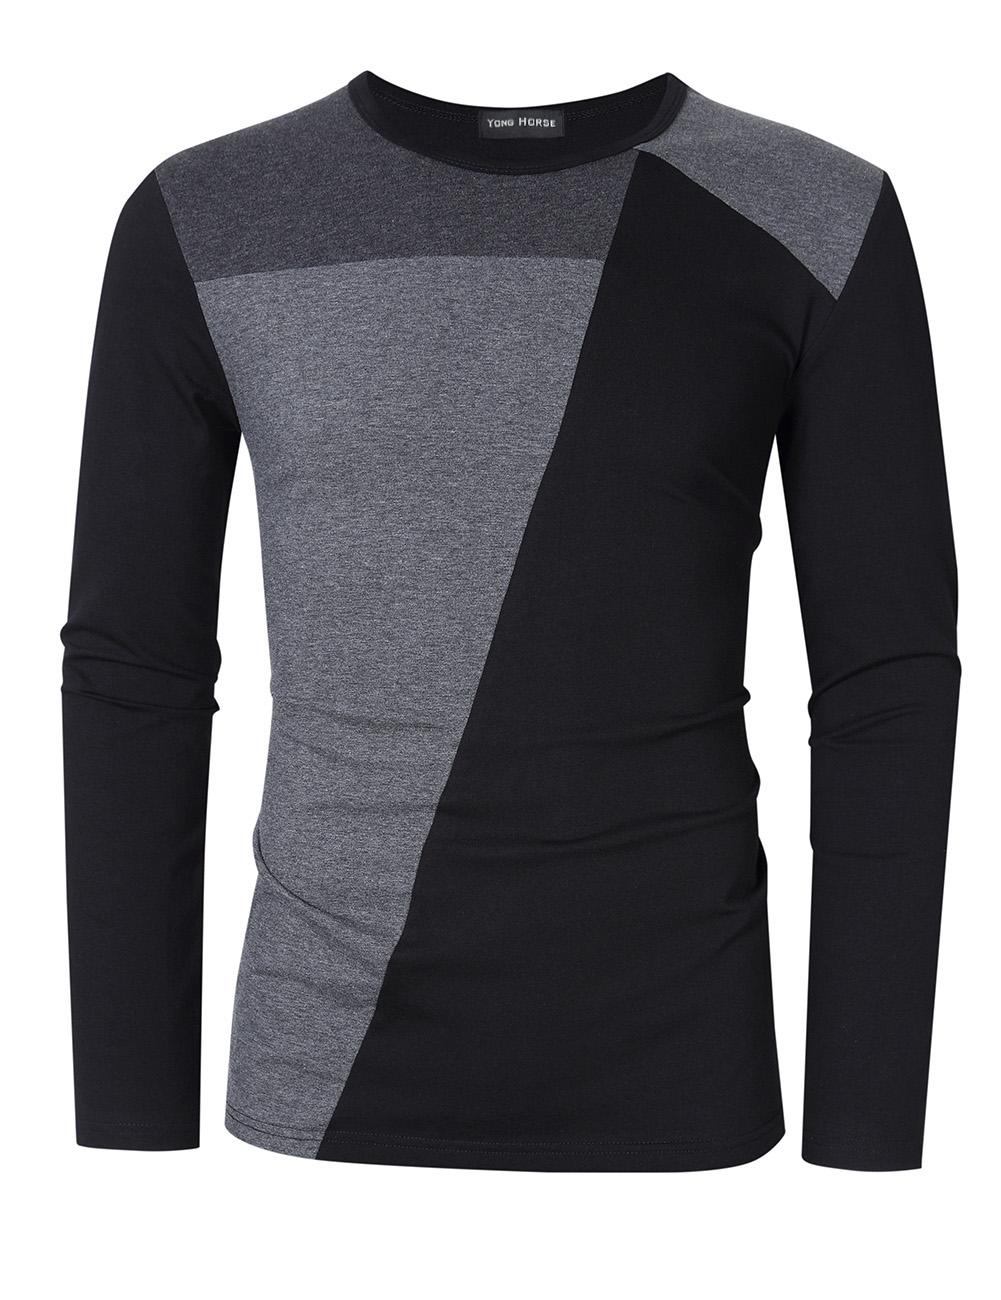 Yong Horse Men's Contrast Color Crew Neck Long Sleeve Basic T-Shirt Top Black gray_2XL